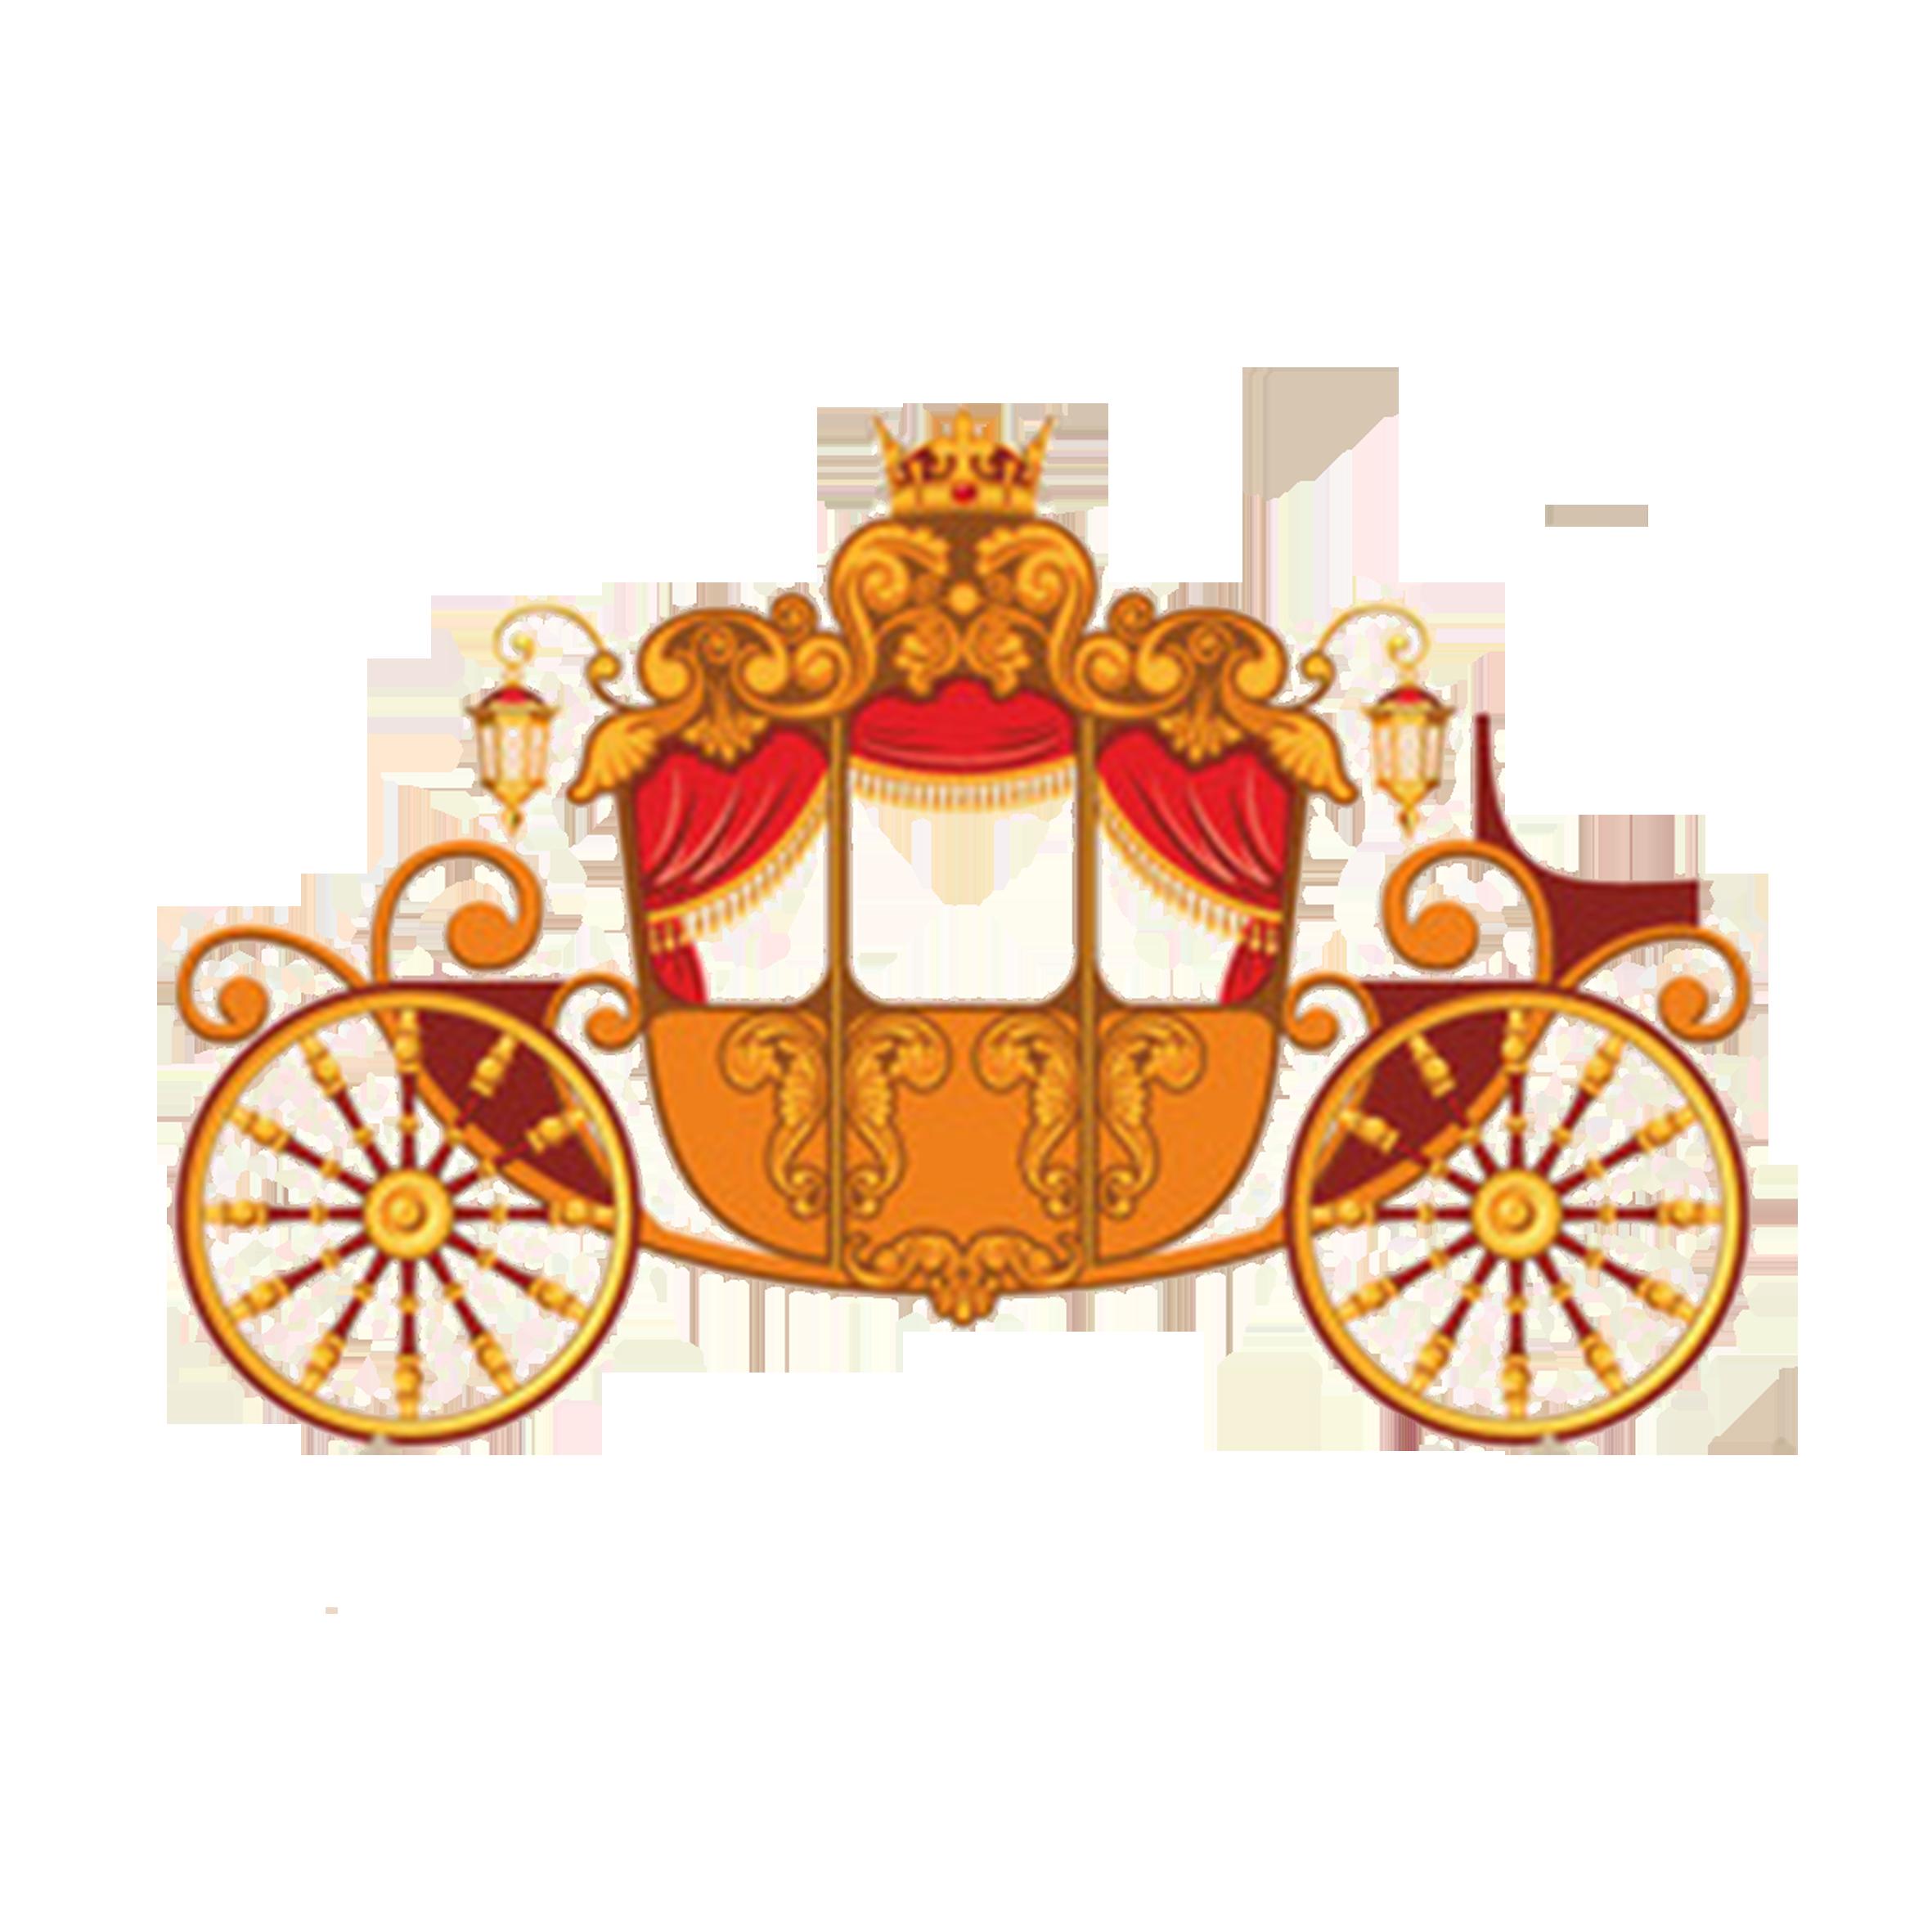 Orange pumpkin clipart vintage svg royalty free download Carriage Horse Clip art - pumpkin car 2362*2362 transprent Png Free ... svg royalty free download